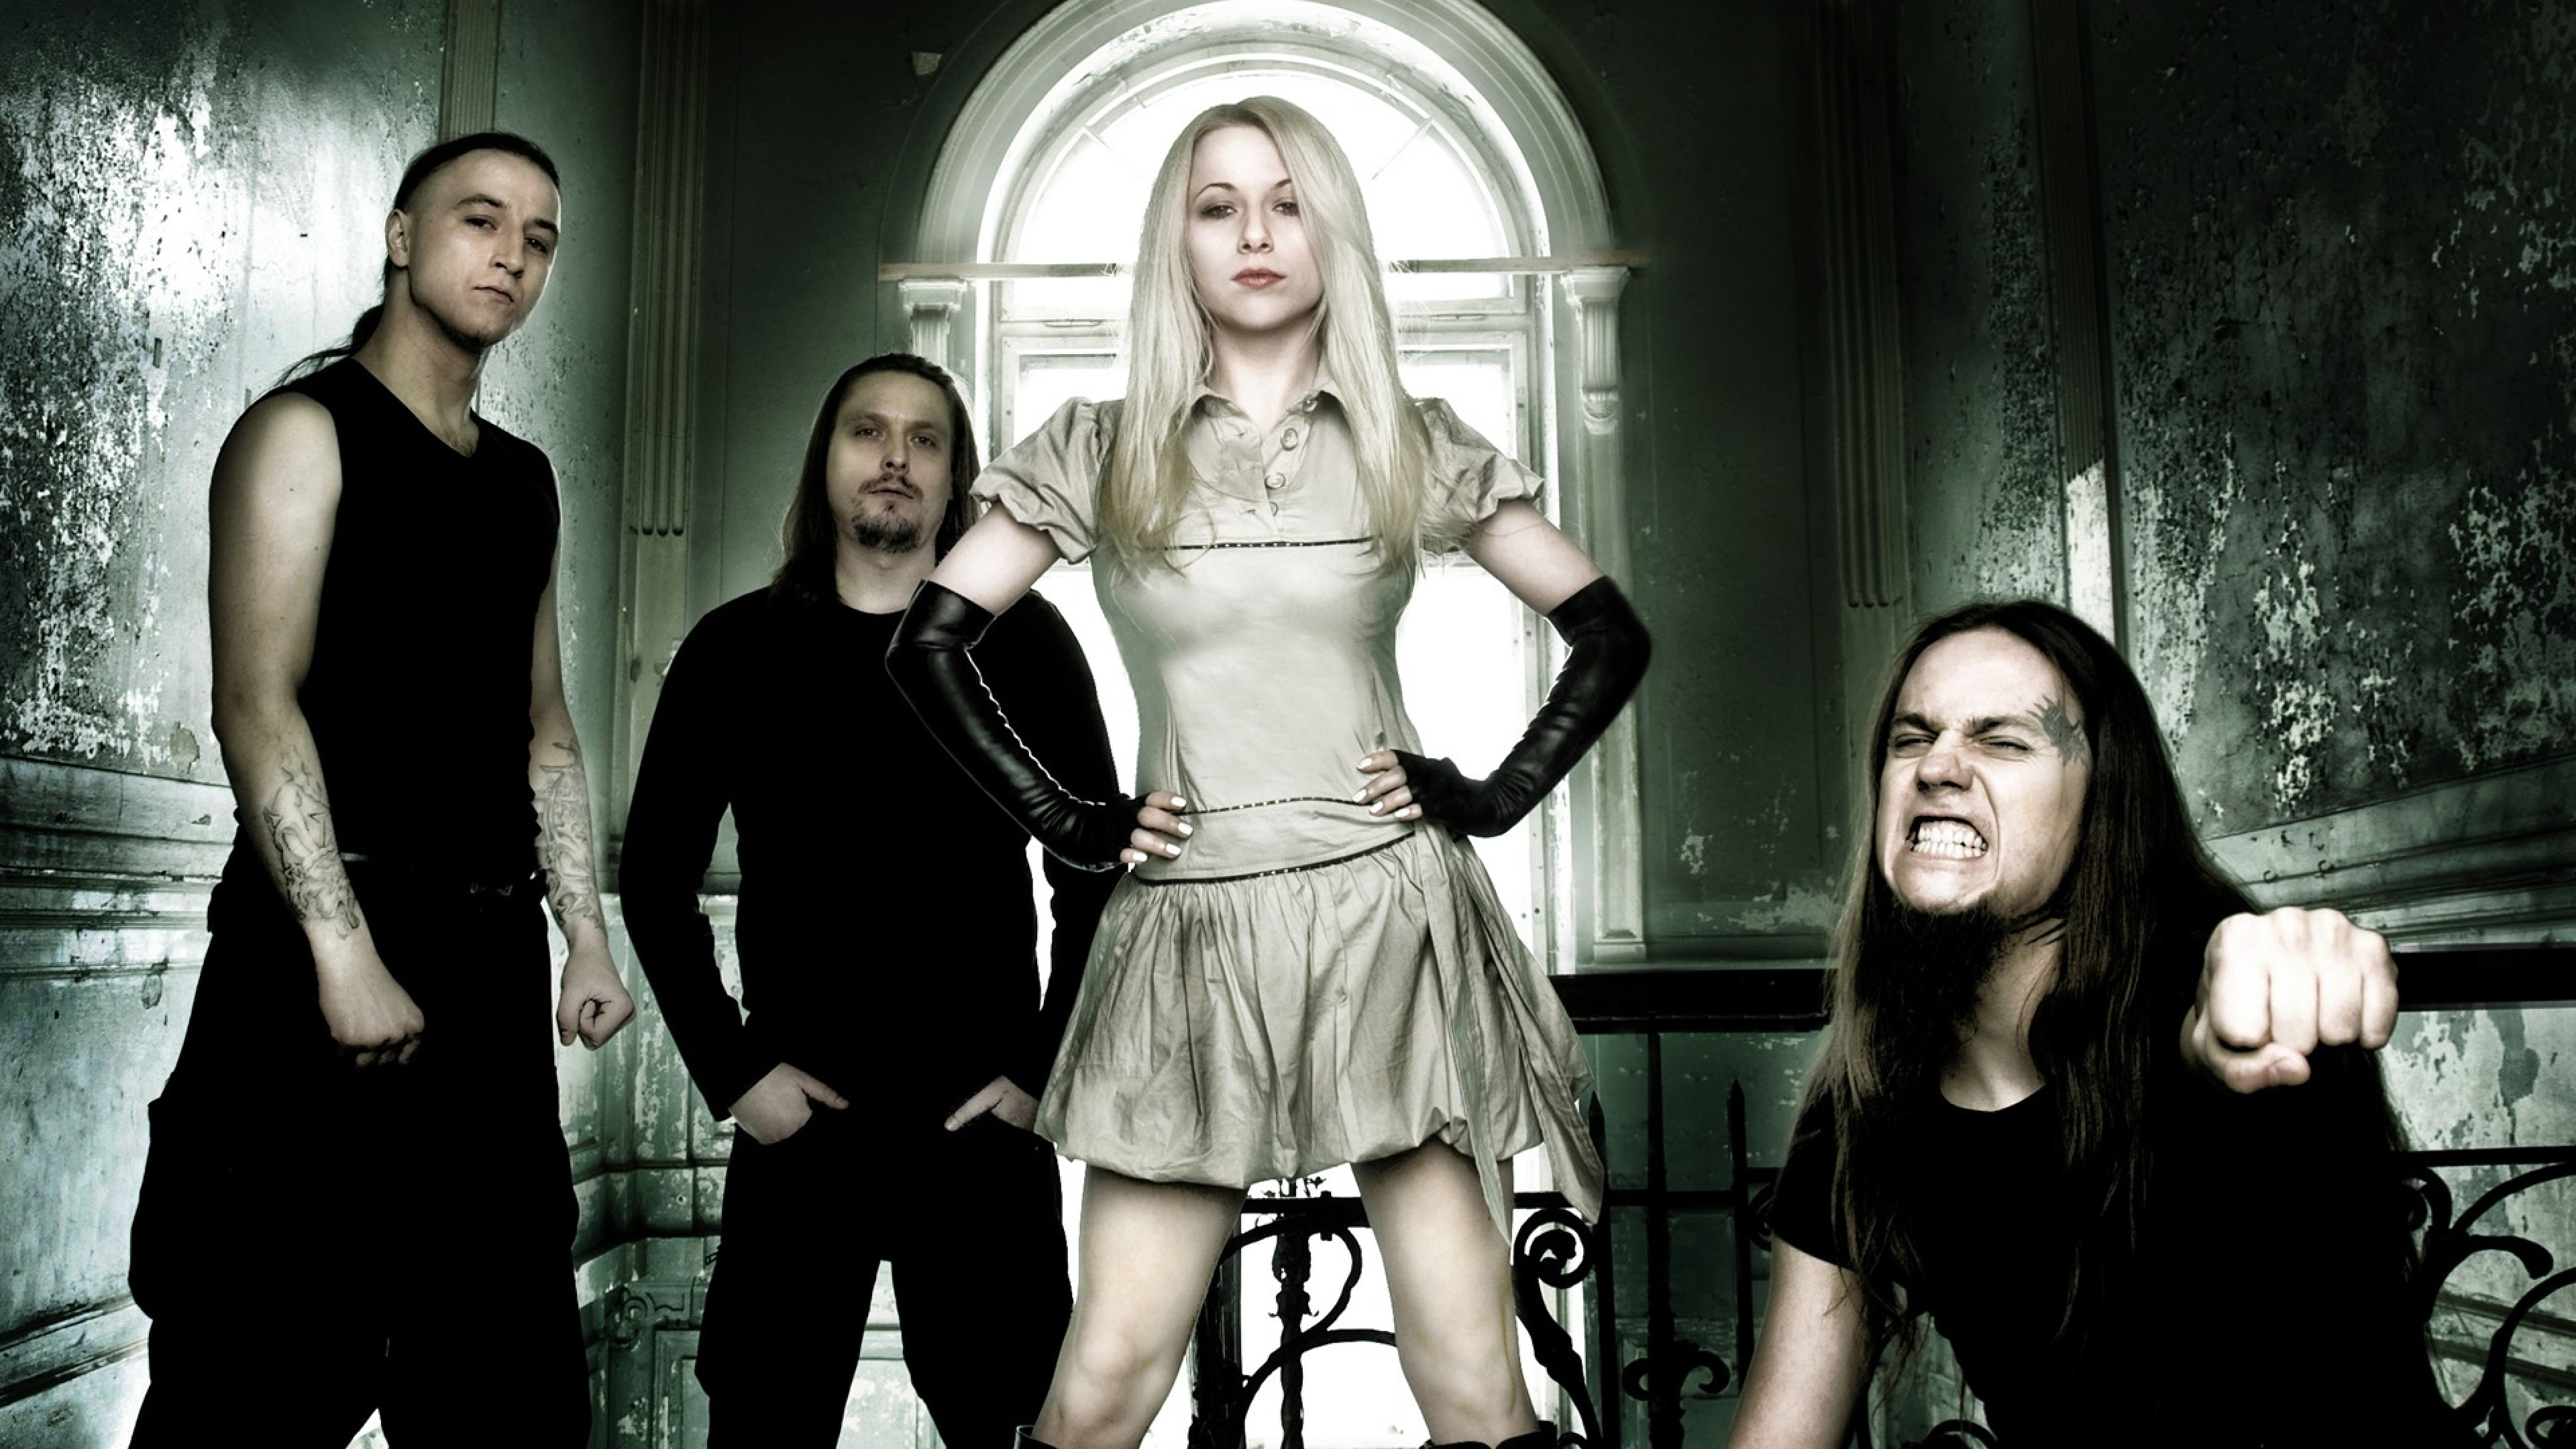 unsun_blonde_girl_band_teeth_14538_3840x2160_1.jpg